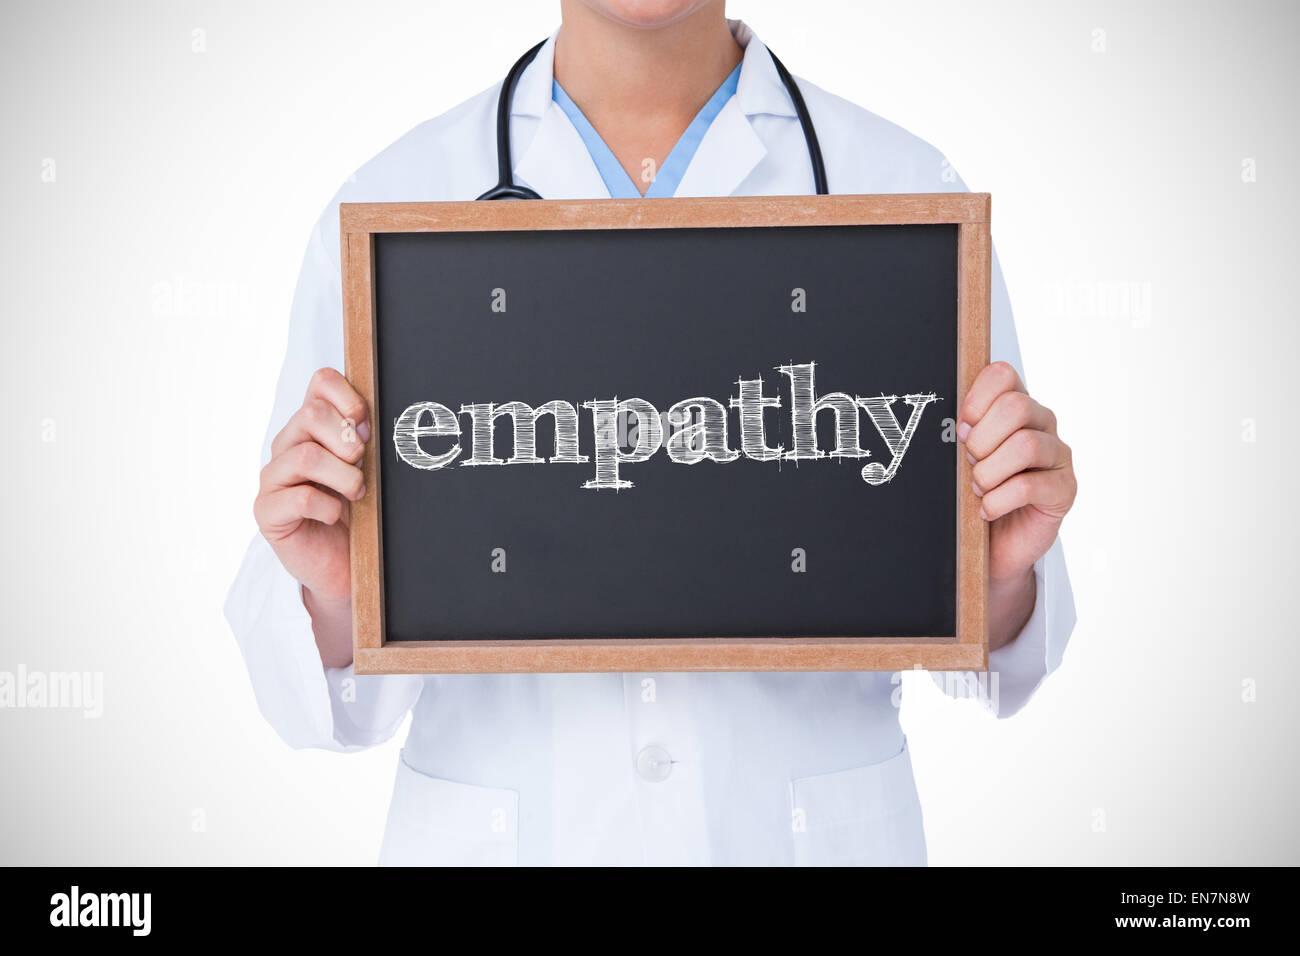 Empathy against doctor showing little blackboard - Stock Image